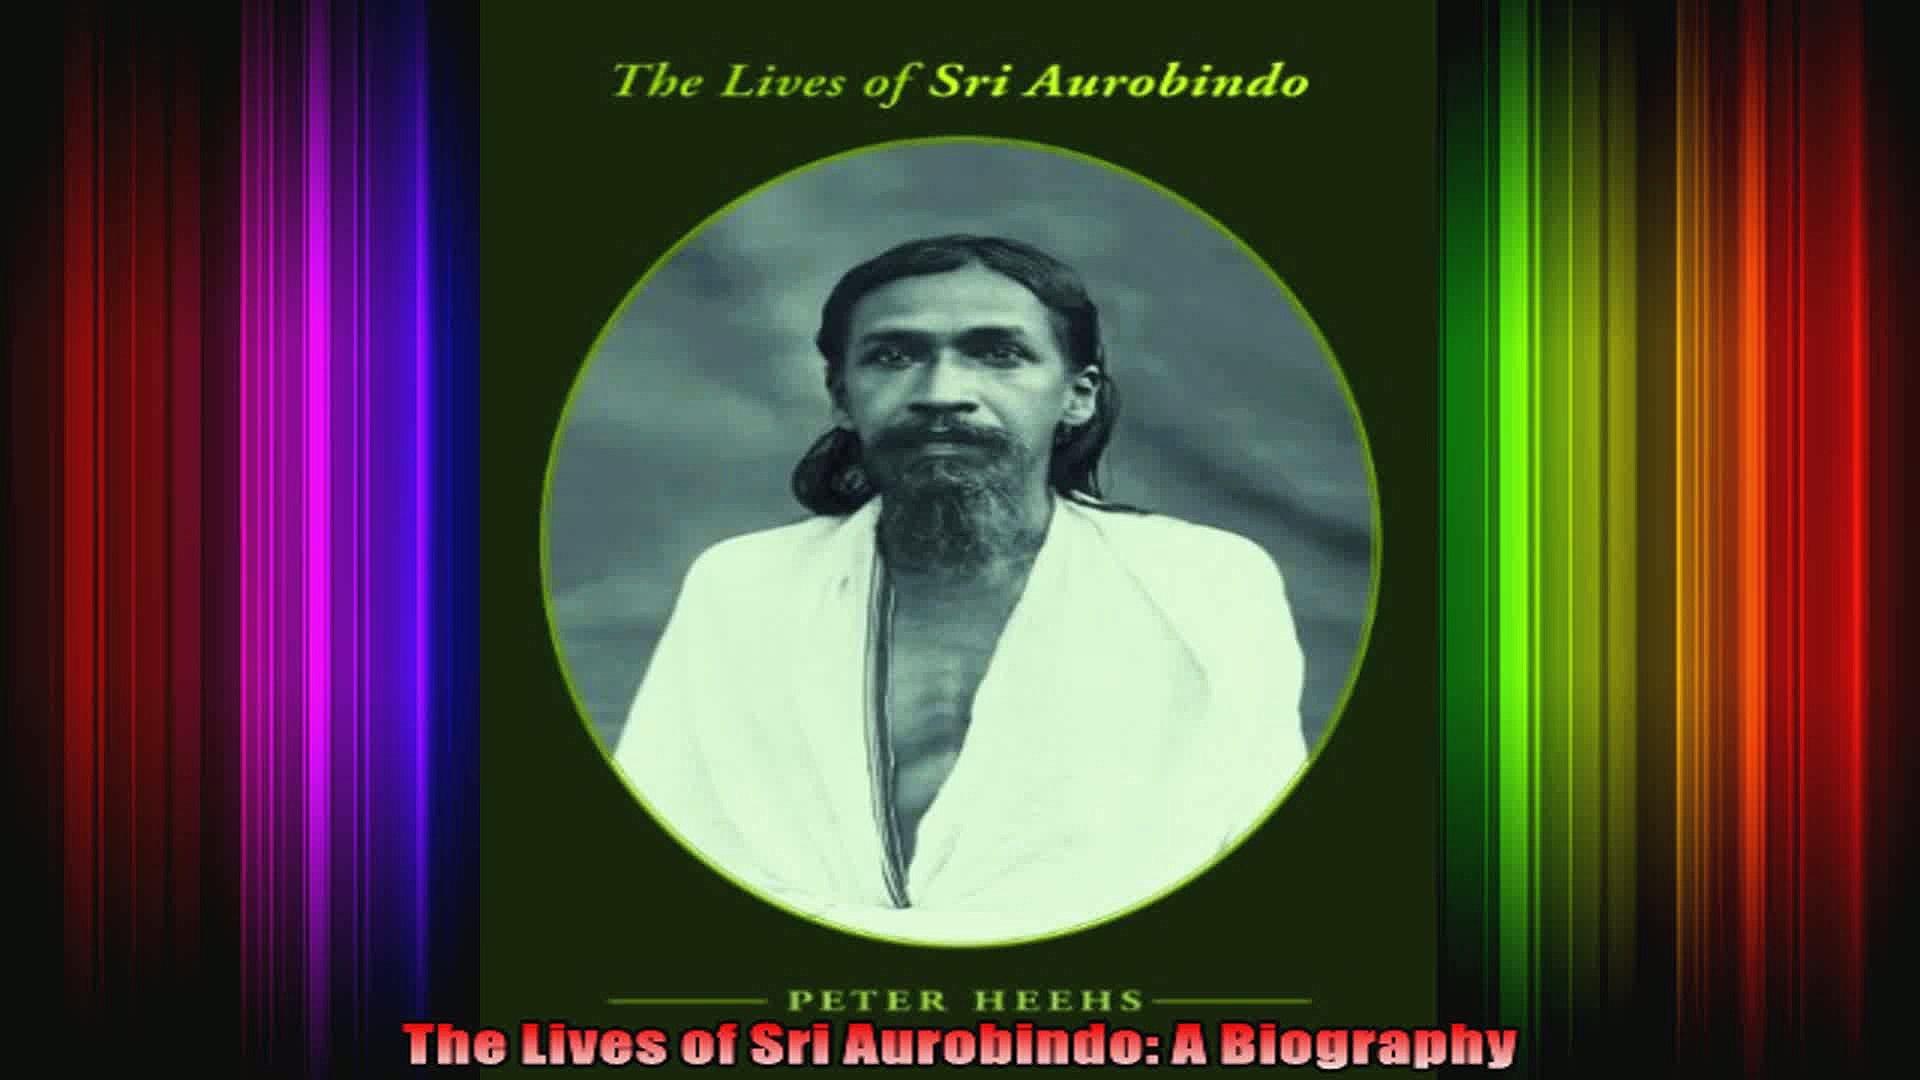 The Lives of Sri Aurobindo: A Biography